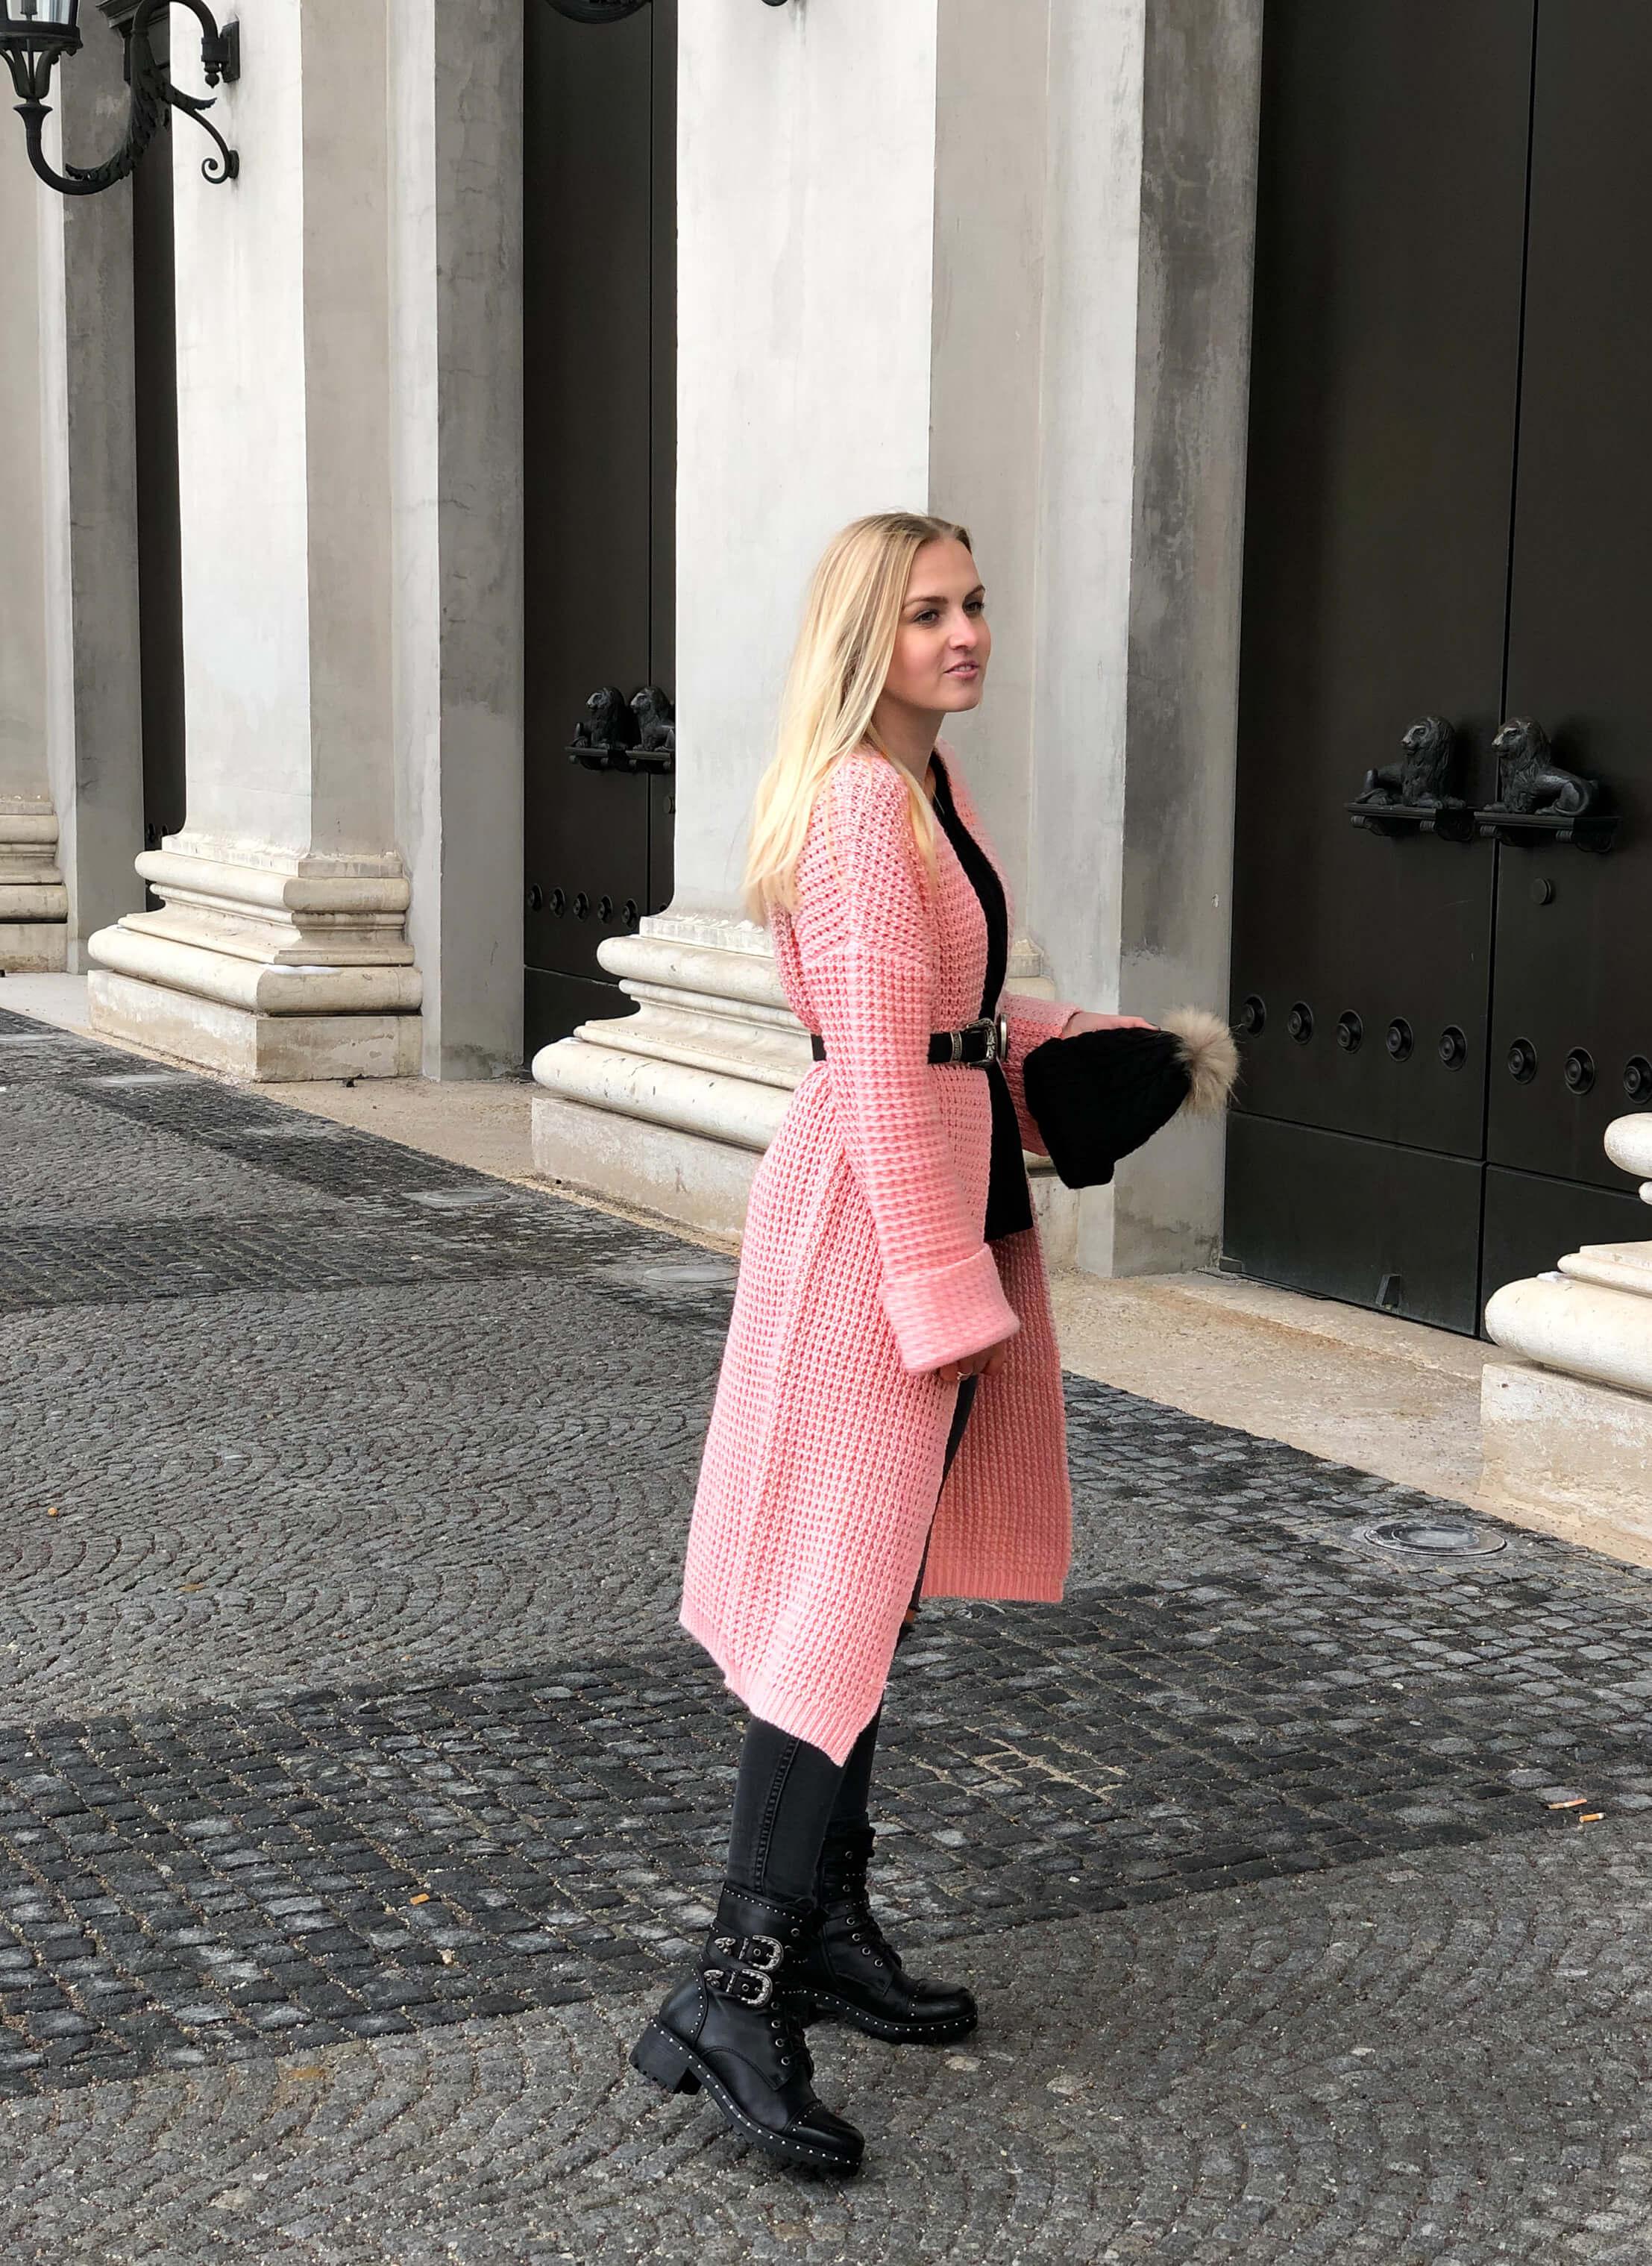 Living Coral, Trendfarbe 2019, Pantone, Trendfarbe, Koralle, Fashionblog, Modeblog, München, Katefully, Cardigan, Pantonetrendfarbe